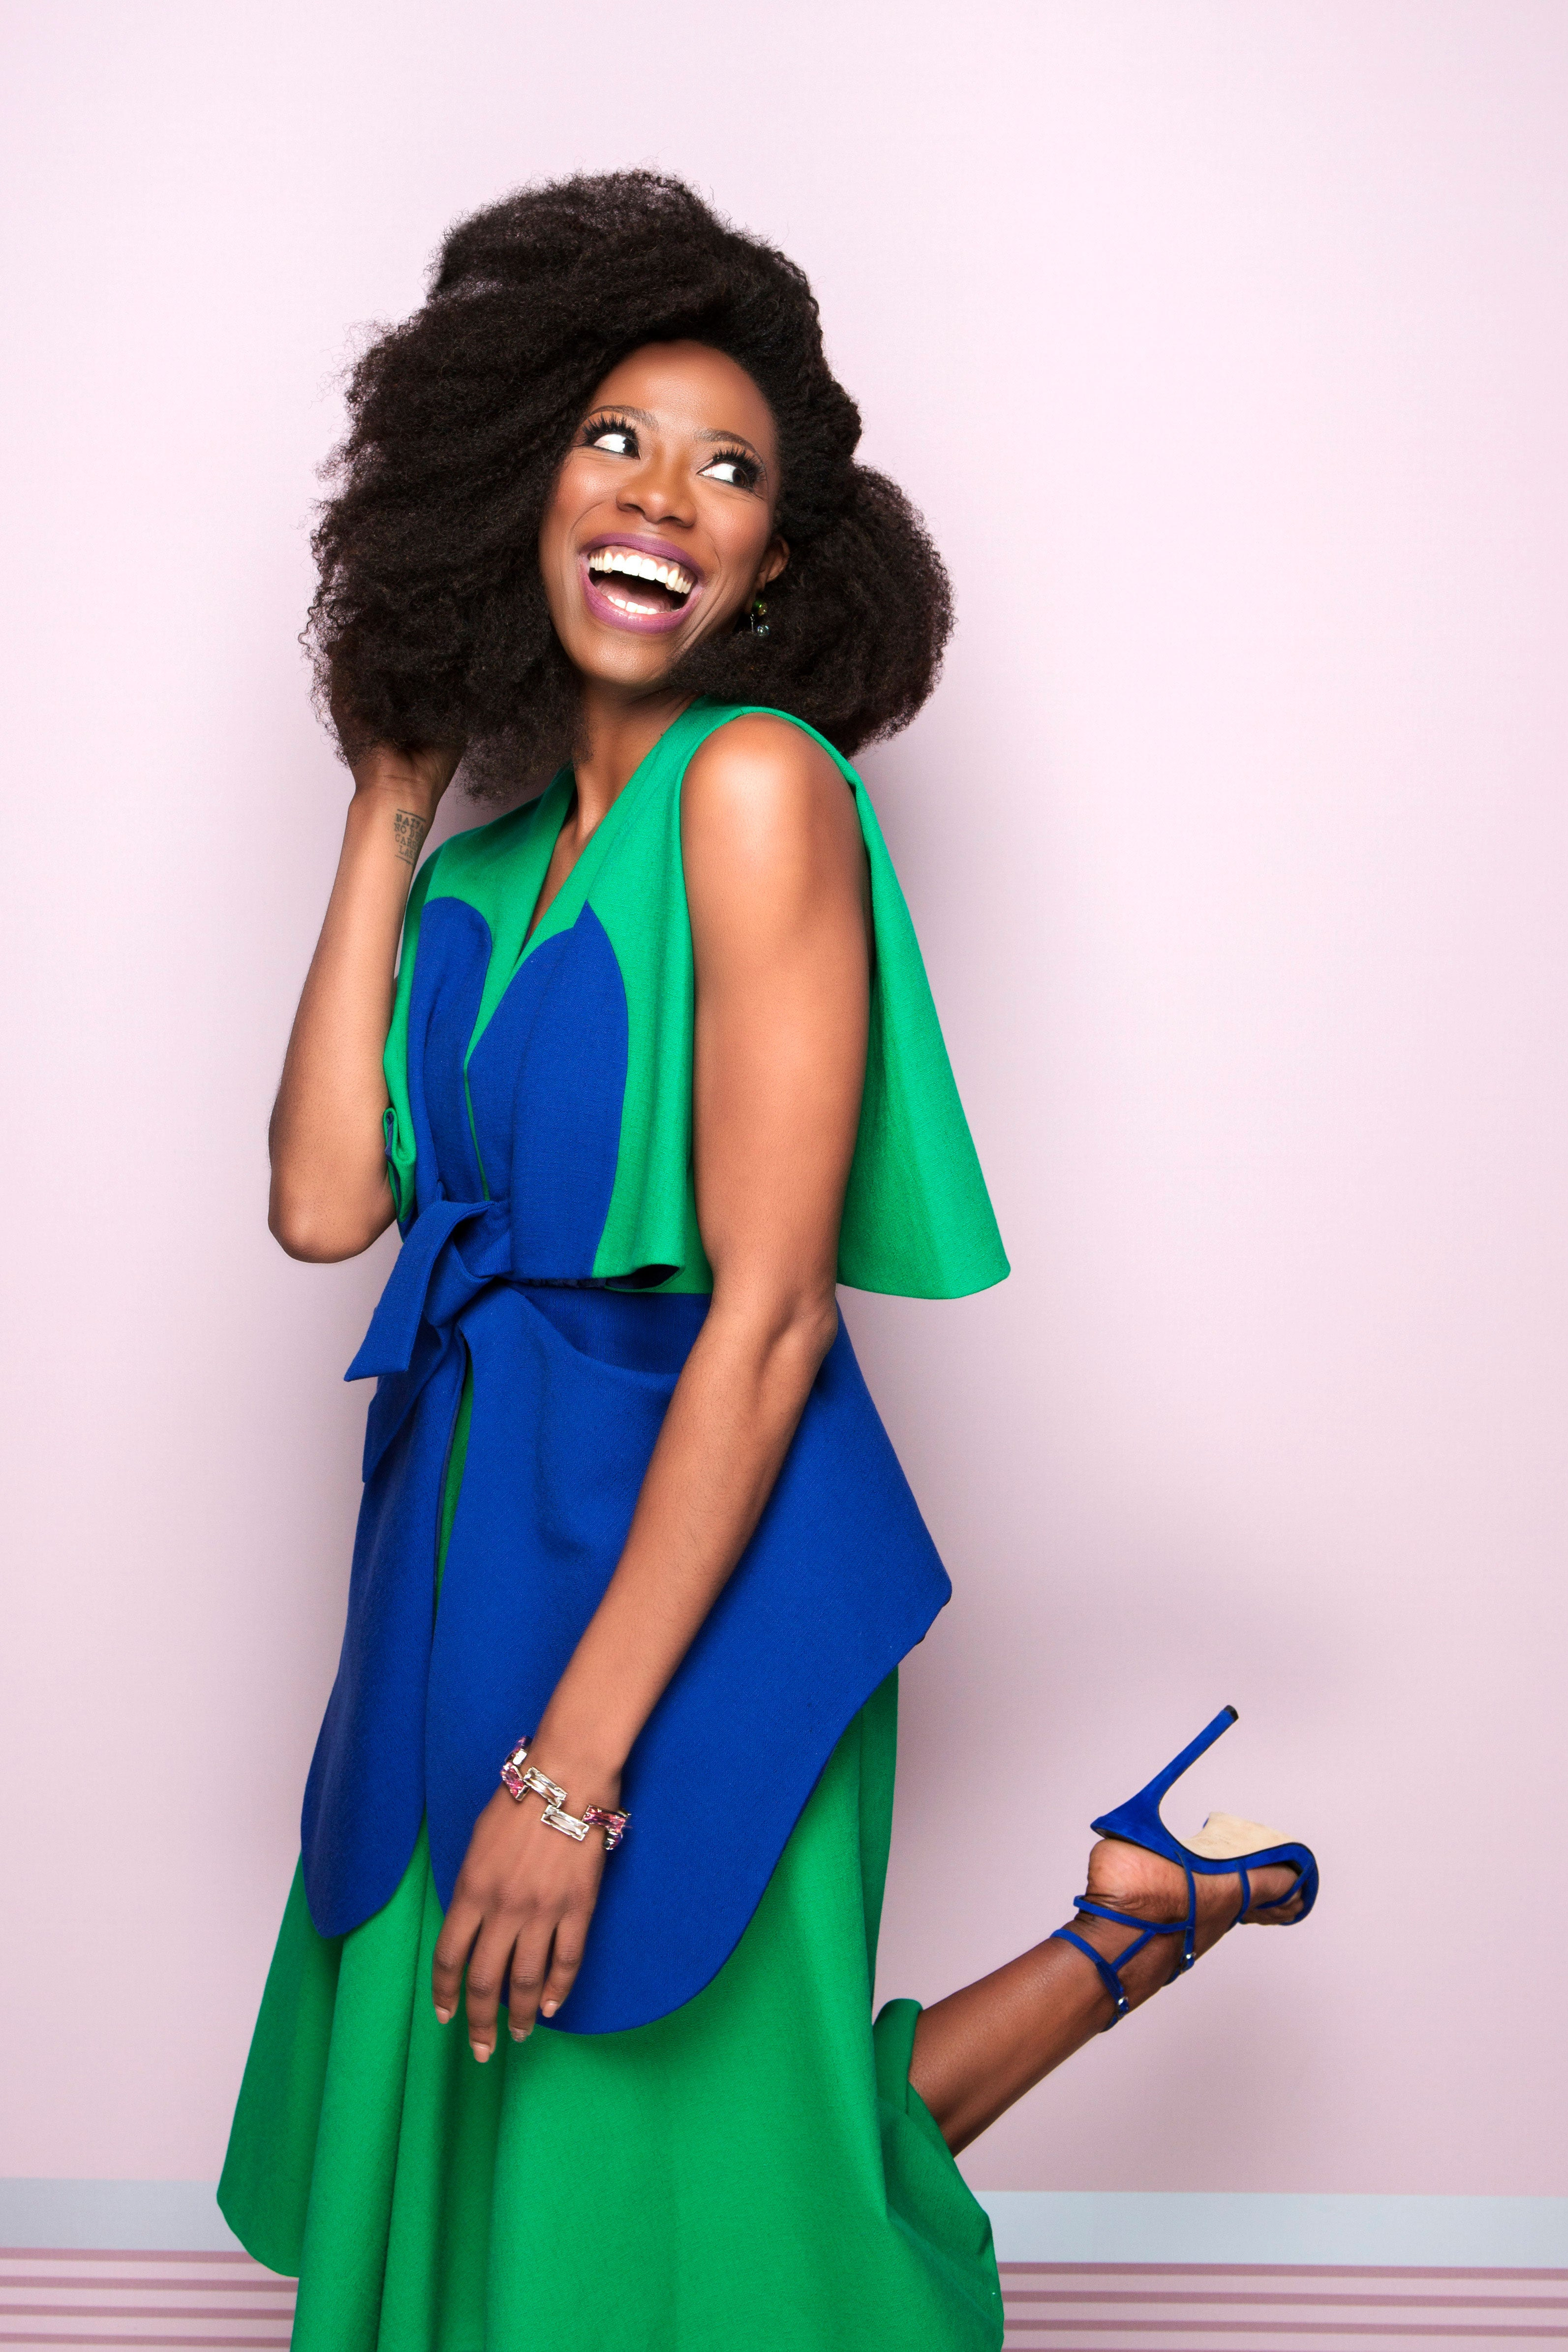 Yvonne Orji Shows Off Her Radiant Smile As Colgate's Latest Brand Ambassador